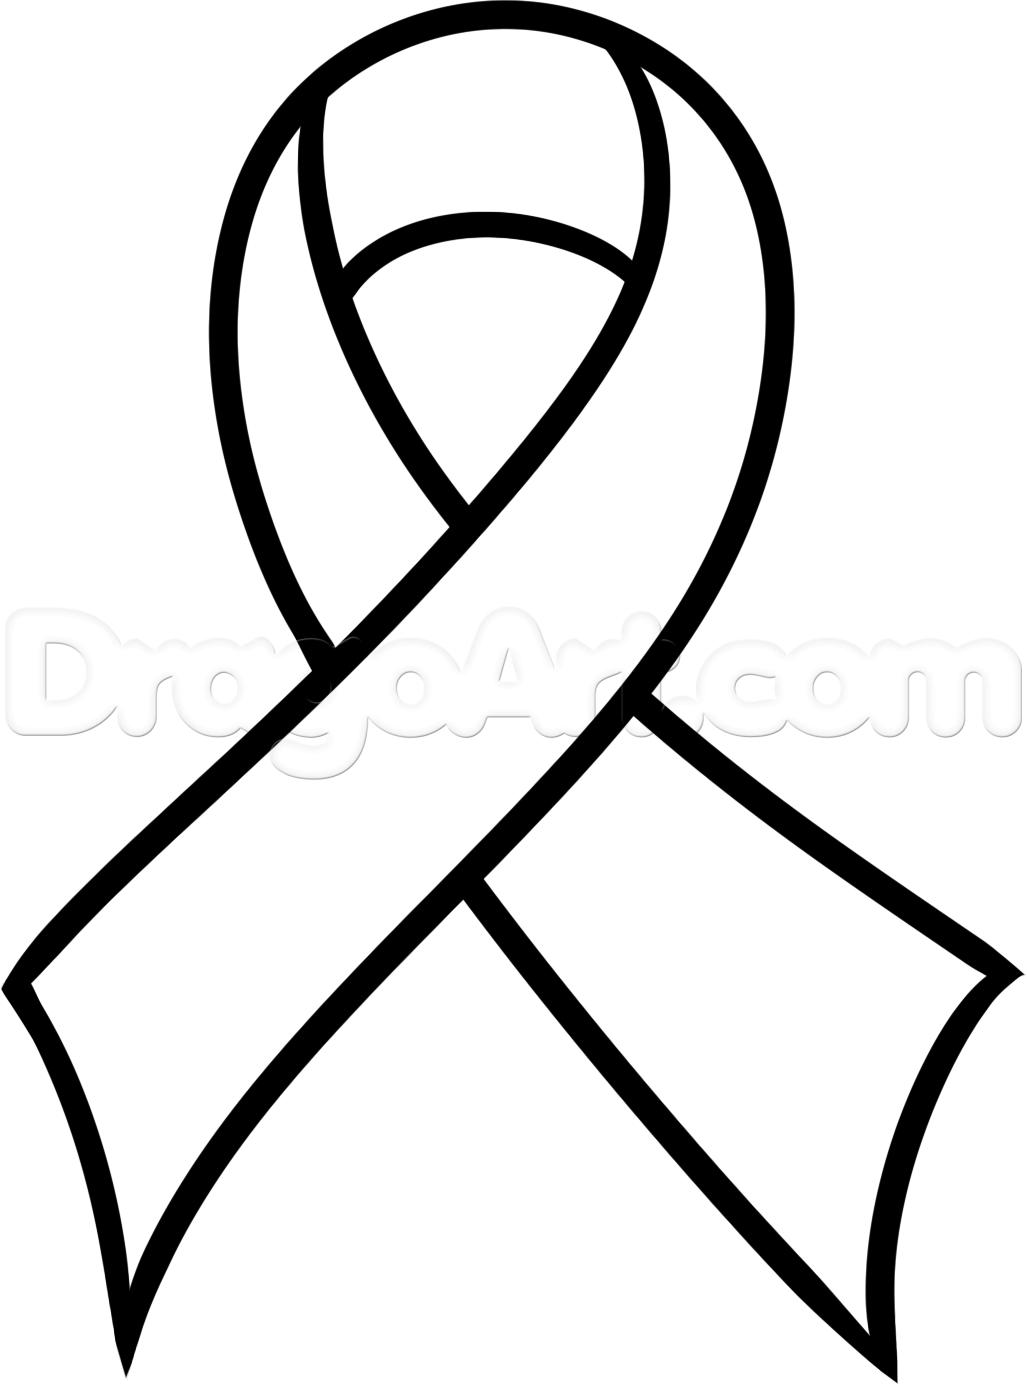 can ary blogs Ribbon Vector Art Cancer Ribbon SVG